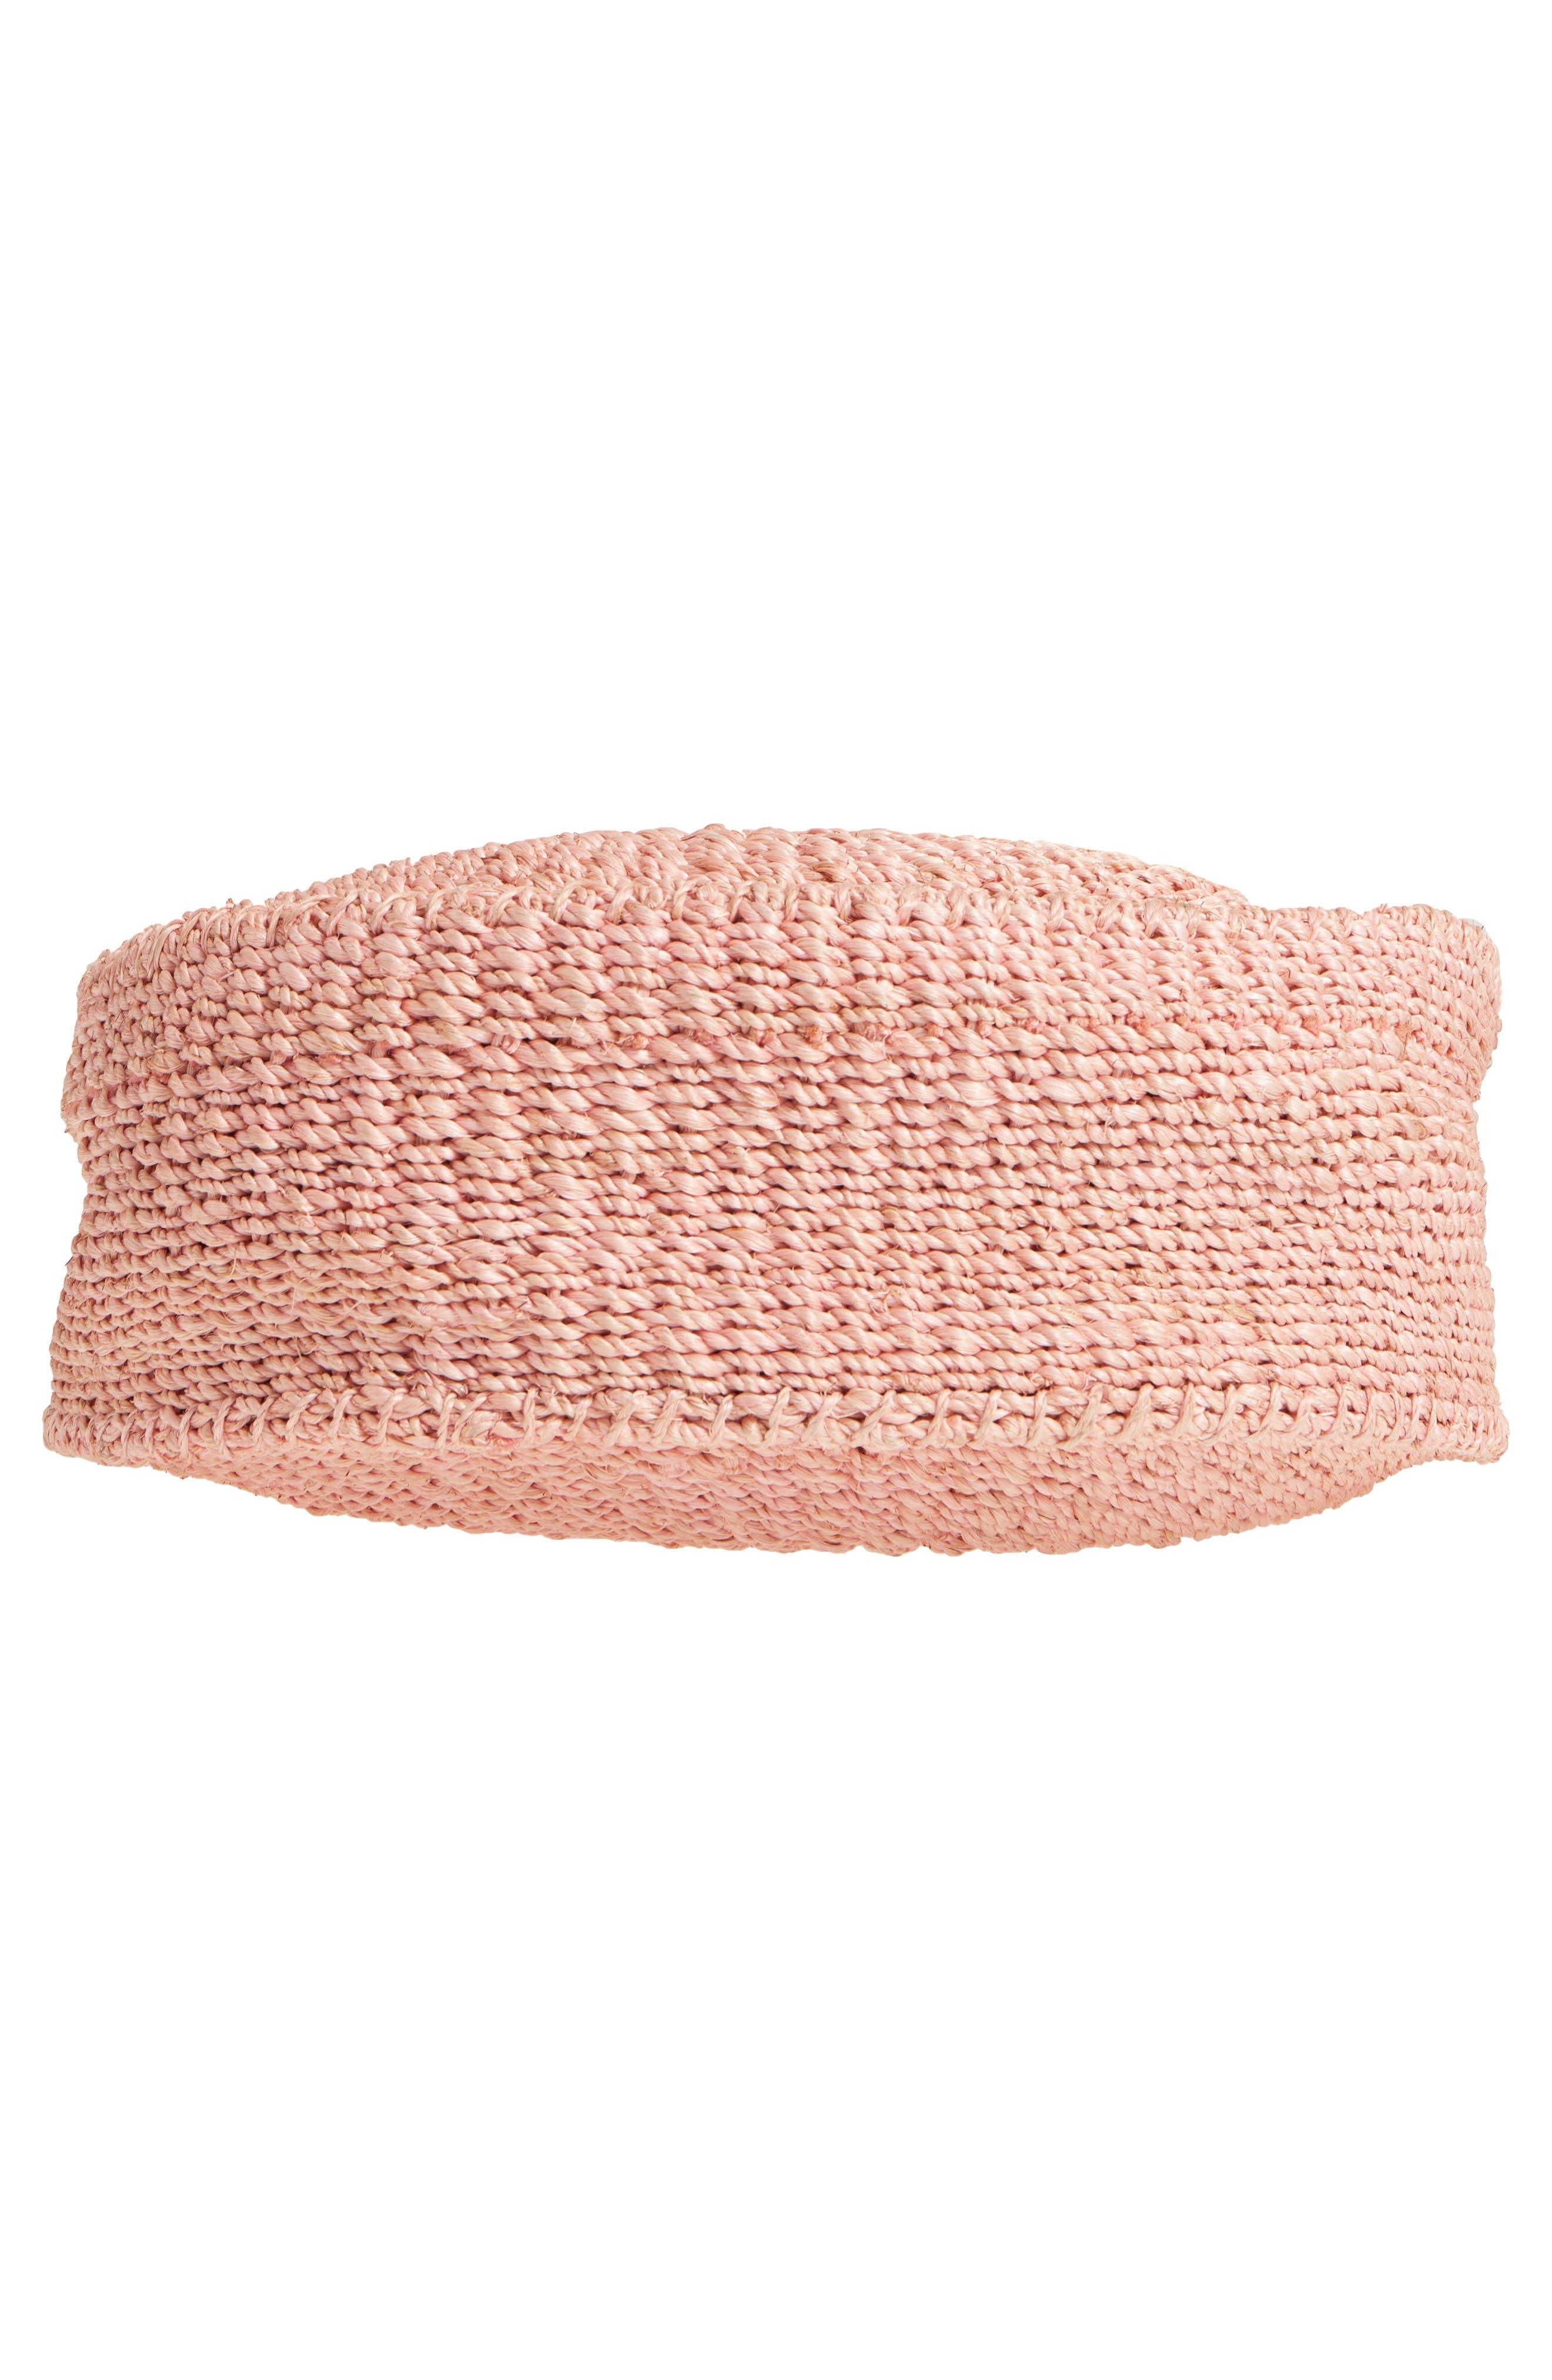 Alice Woven Sisal Straw Bag,                             Alternate thumbnail 6, color,                             Blush Woven